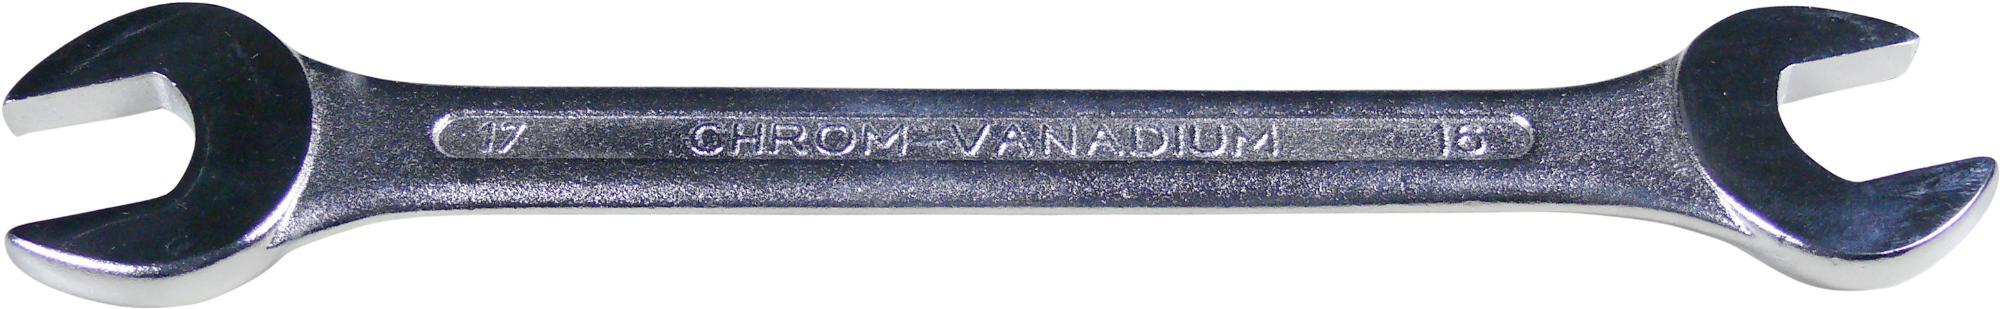 Kľúč vidlica-vidlica, 24x27 mm